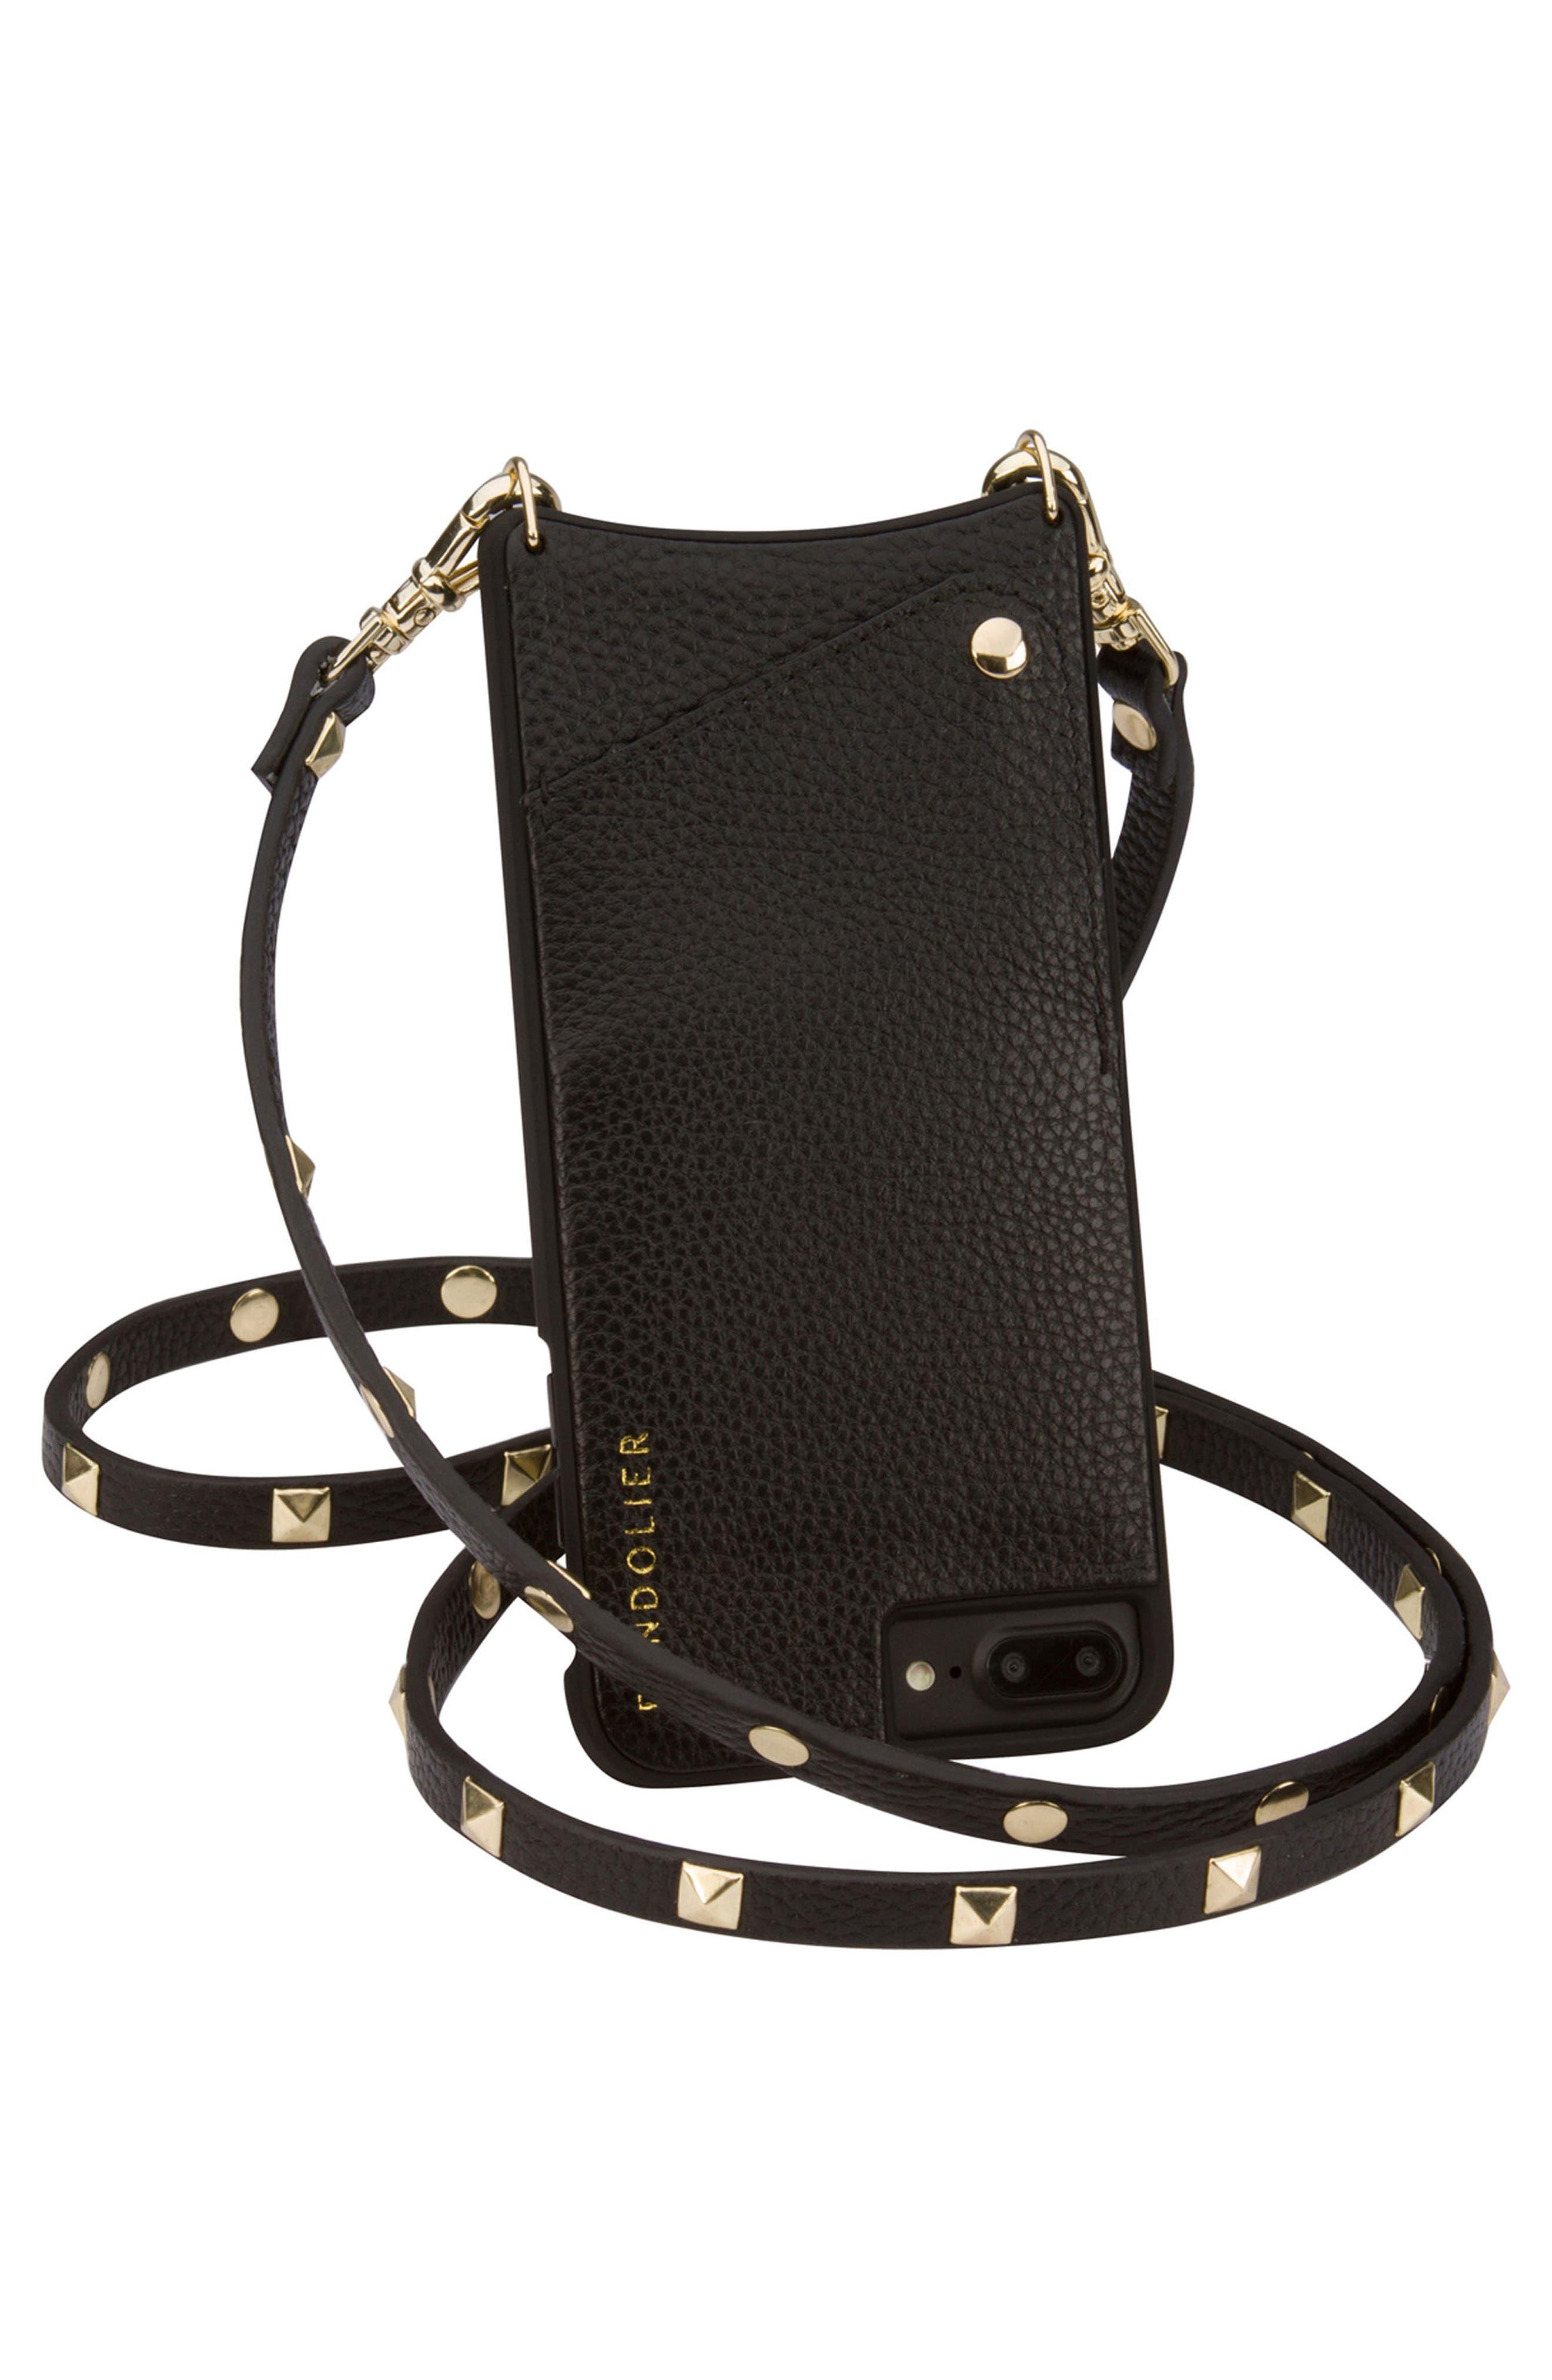 Sarah Leather iPhone 6/7/8 & 6/7/8 Plus Crossbody Case,                             Alternate thumbnail 3, color,                             New Black/ Gold